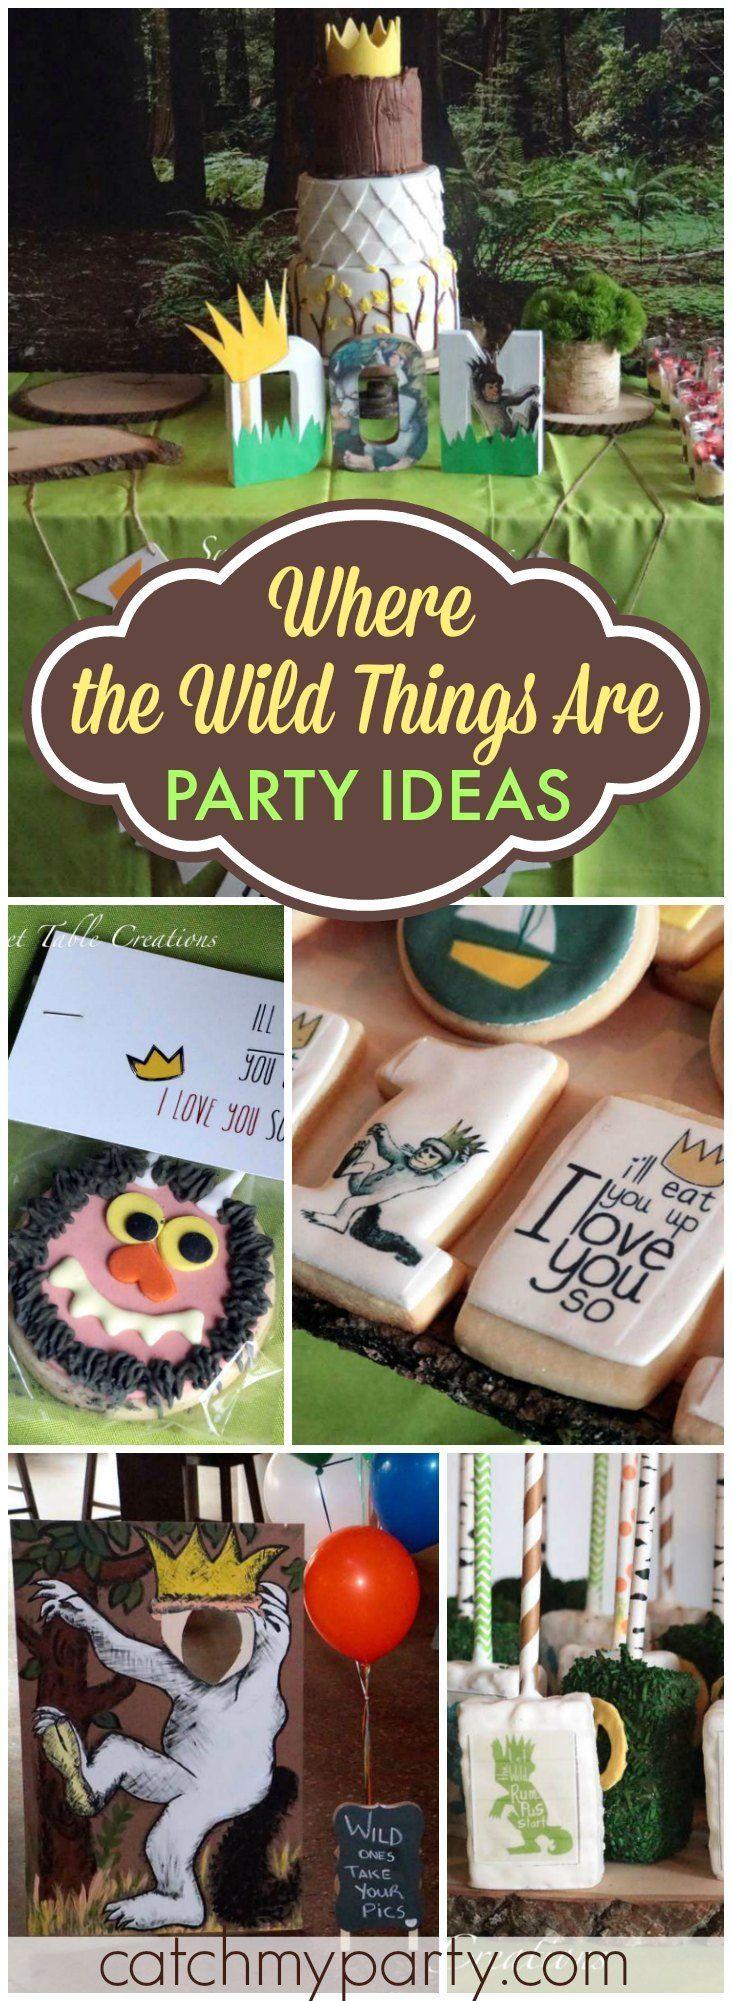 Pin on boy birthday party ideas themes